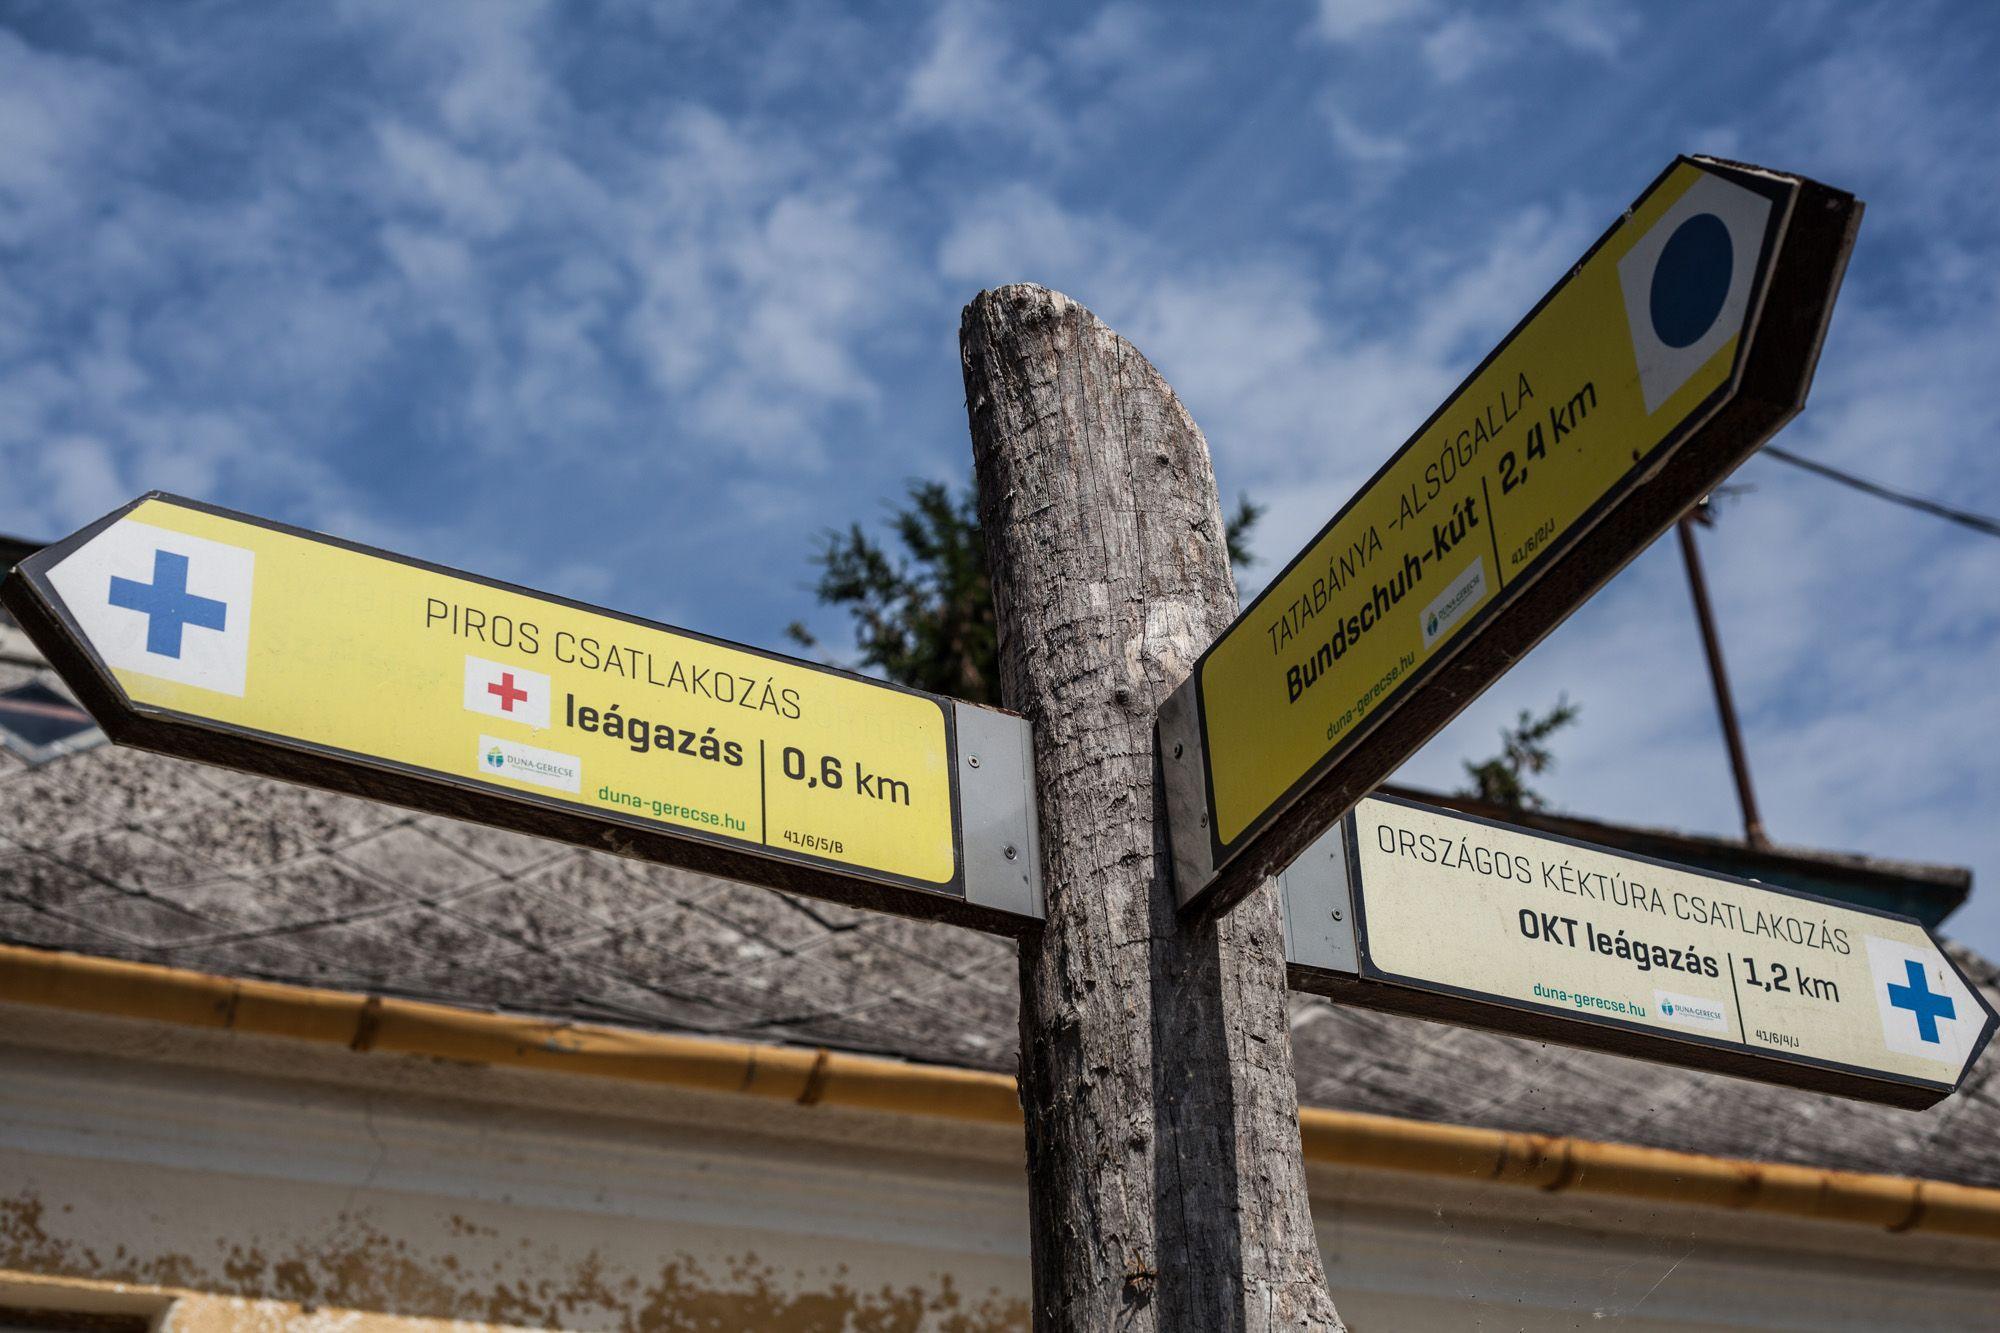 Vértestolna utazás magyar tájak falusi turizmus fotók: Czvitkovits Judit